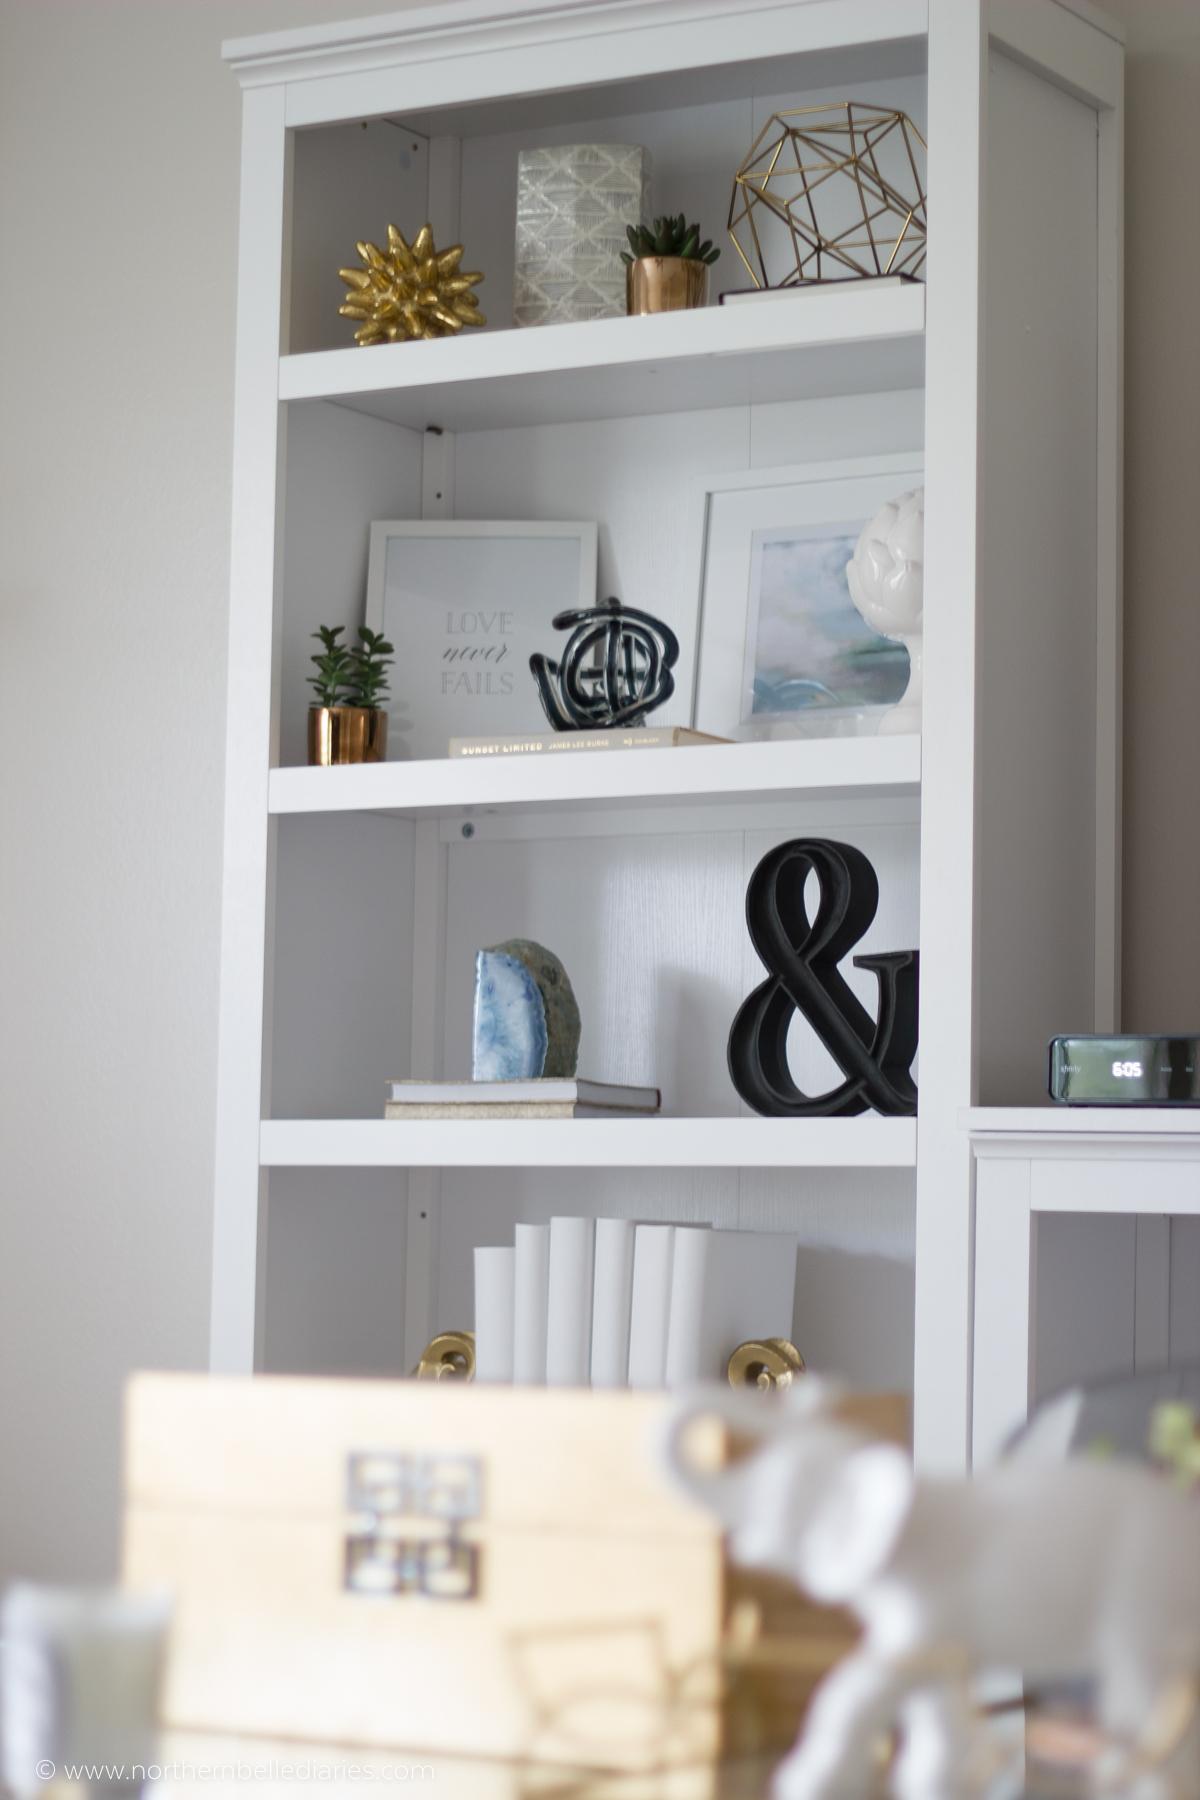 bookshelf in progress #bookshelfstylingclass #decor